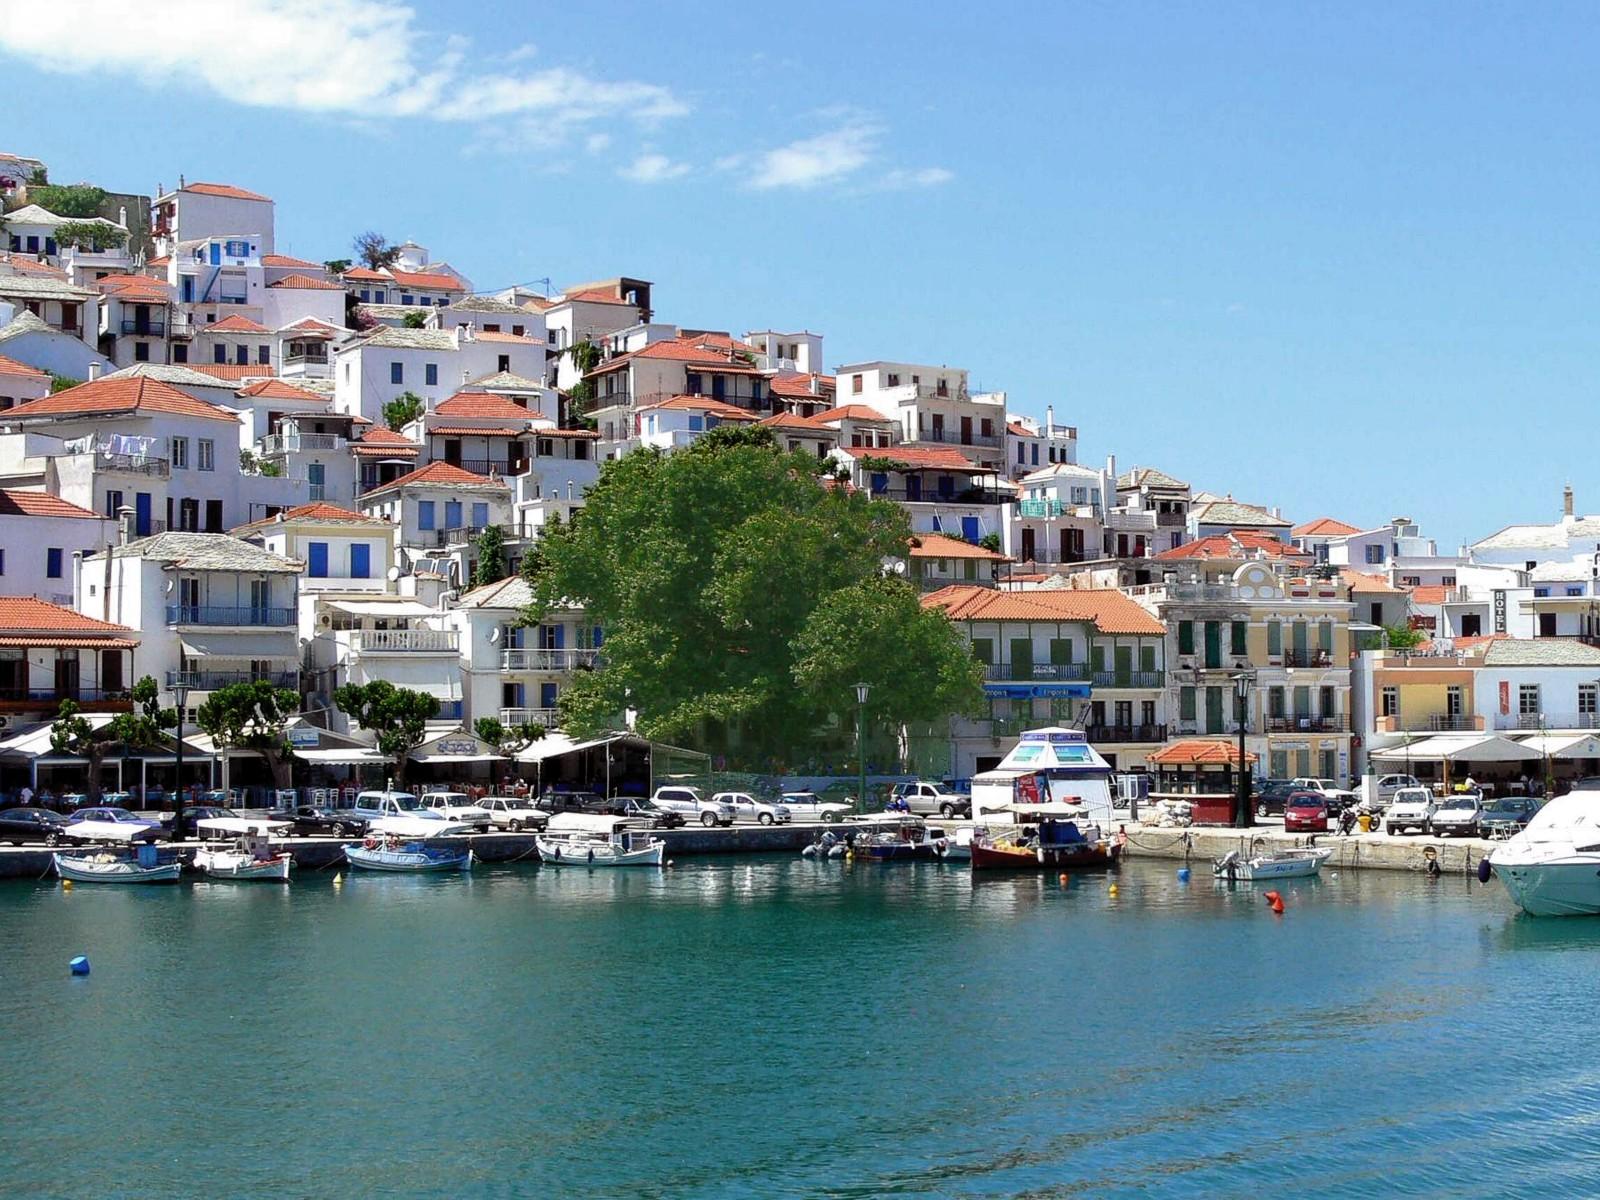 Noleggio Barche Skopelos – Isola di Skopelos - Navalia | Noleggia un Sogno